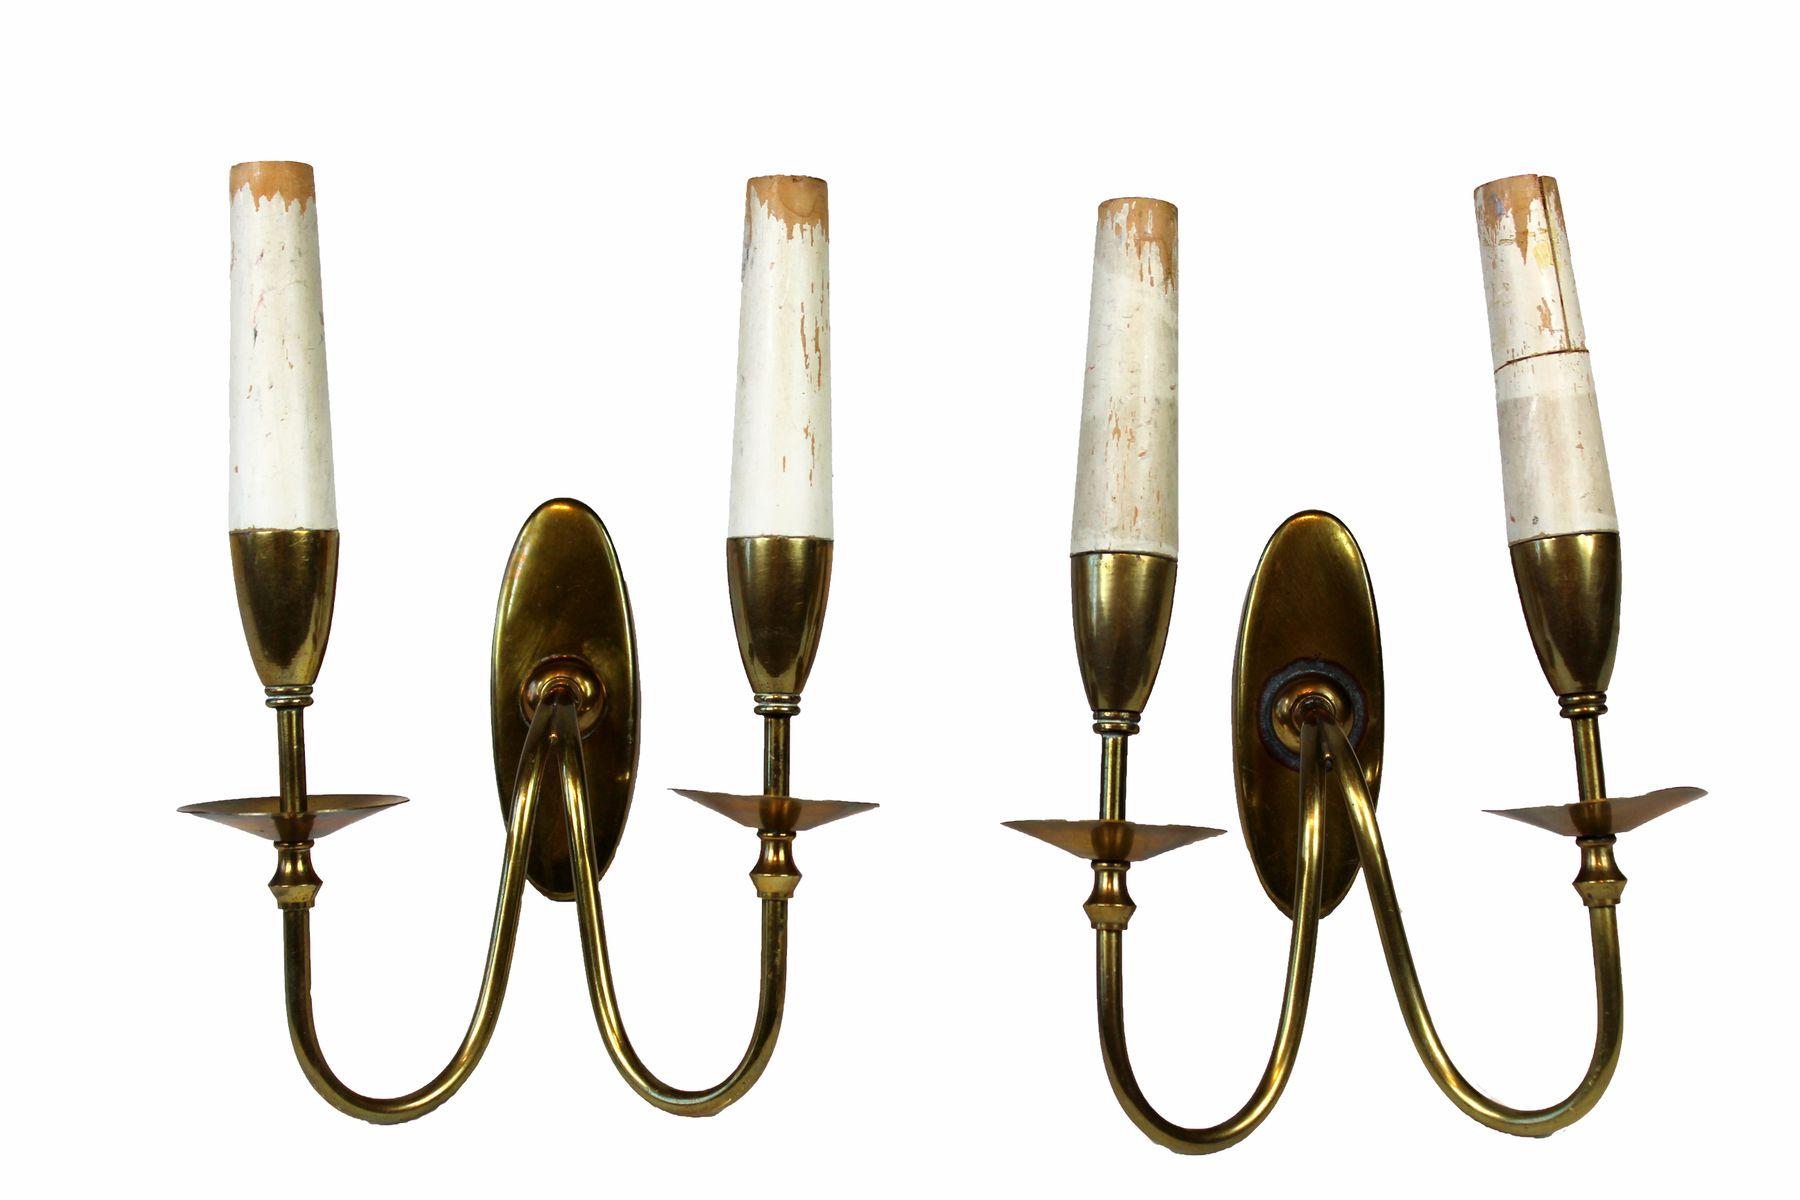 Venezianische Messing Wandlampen, 1930er, 2er Set